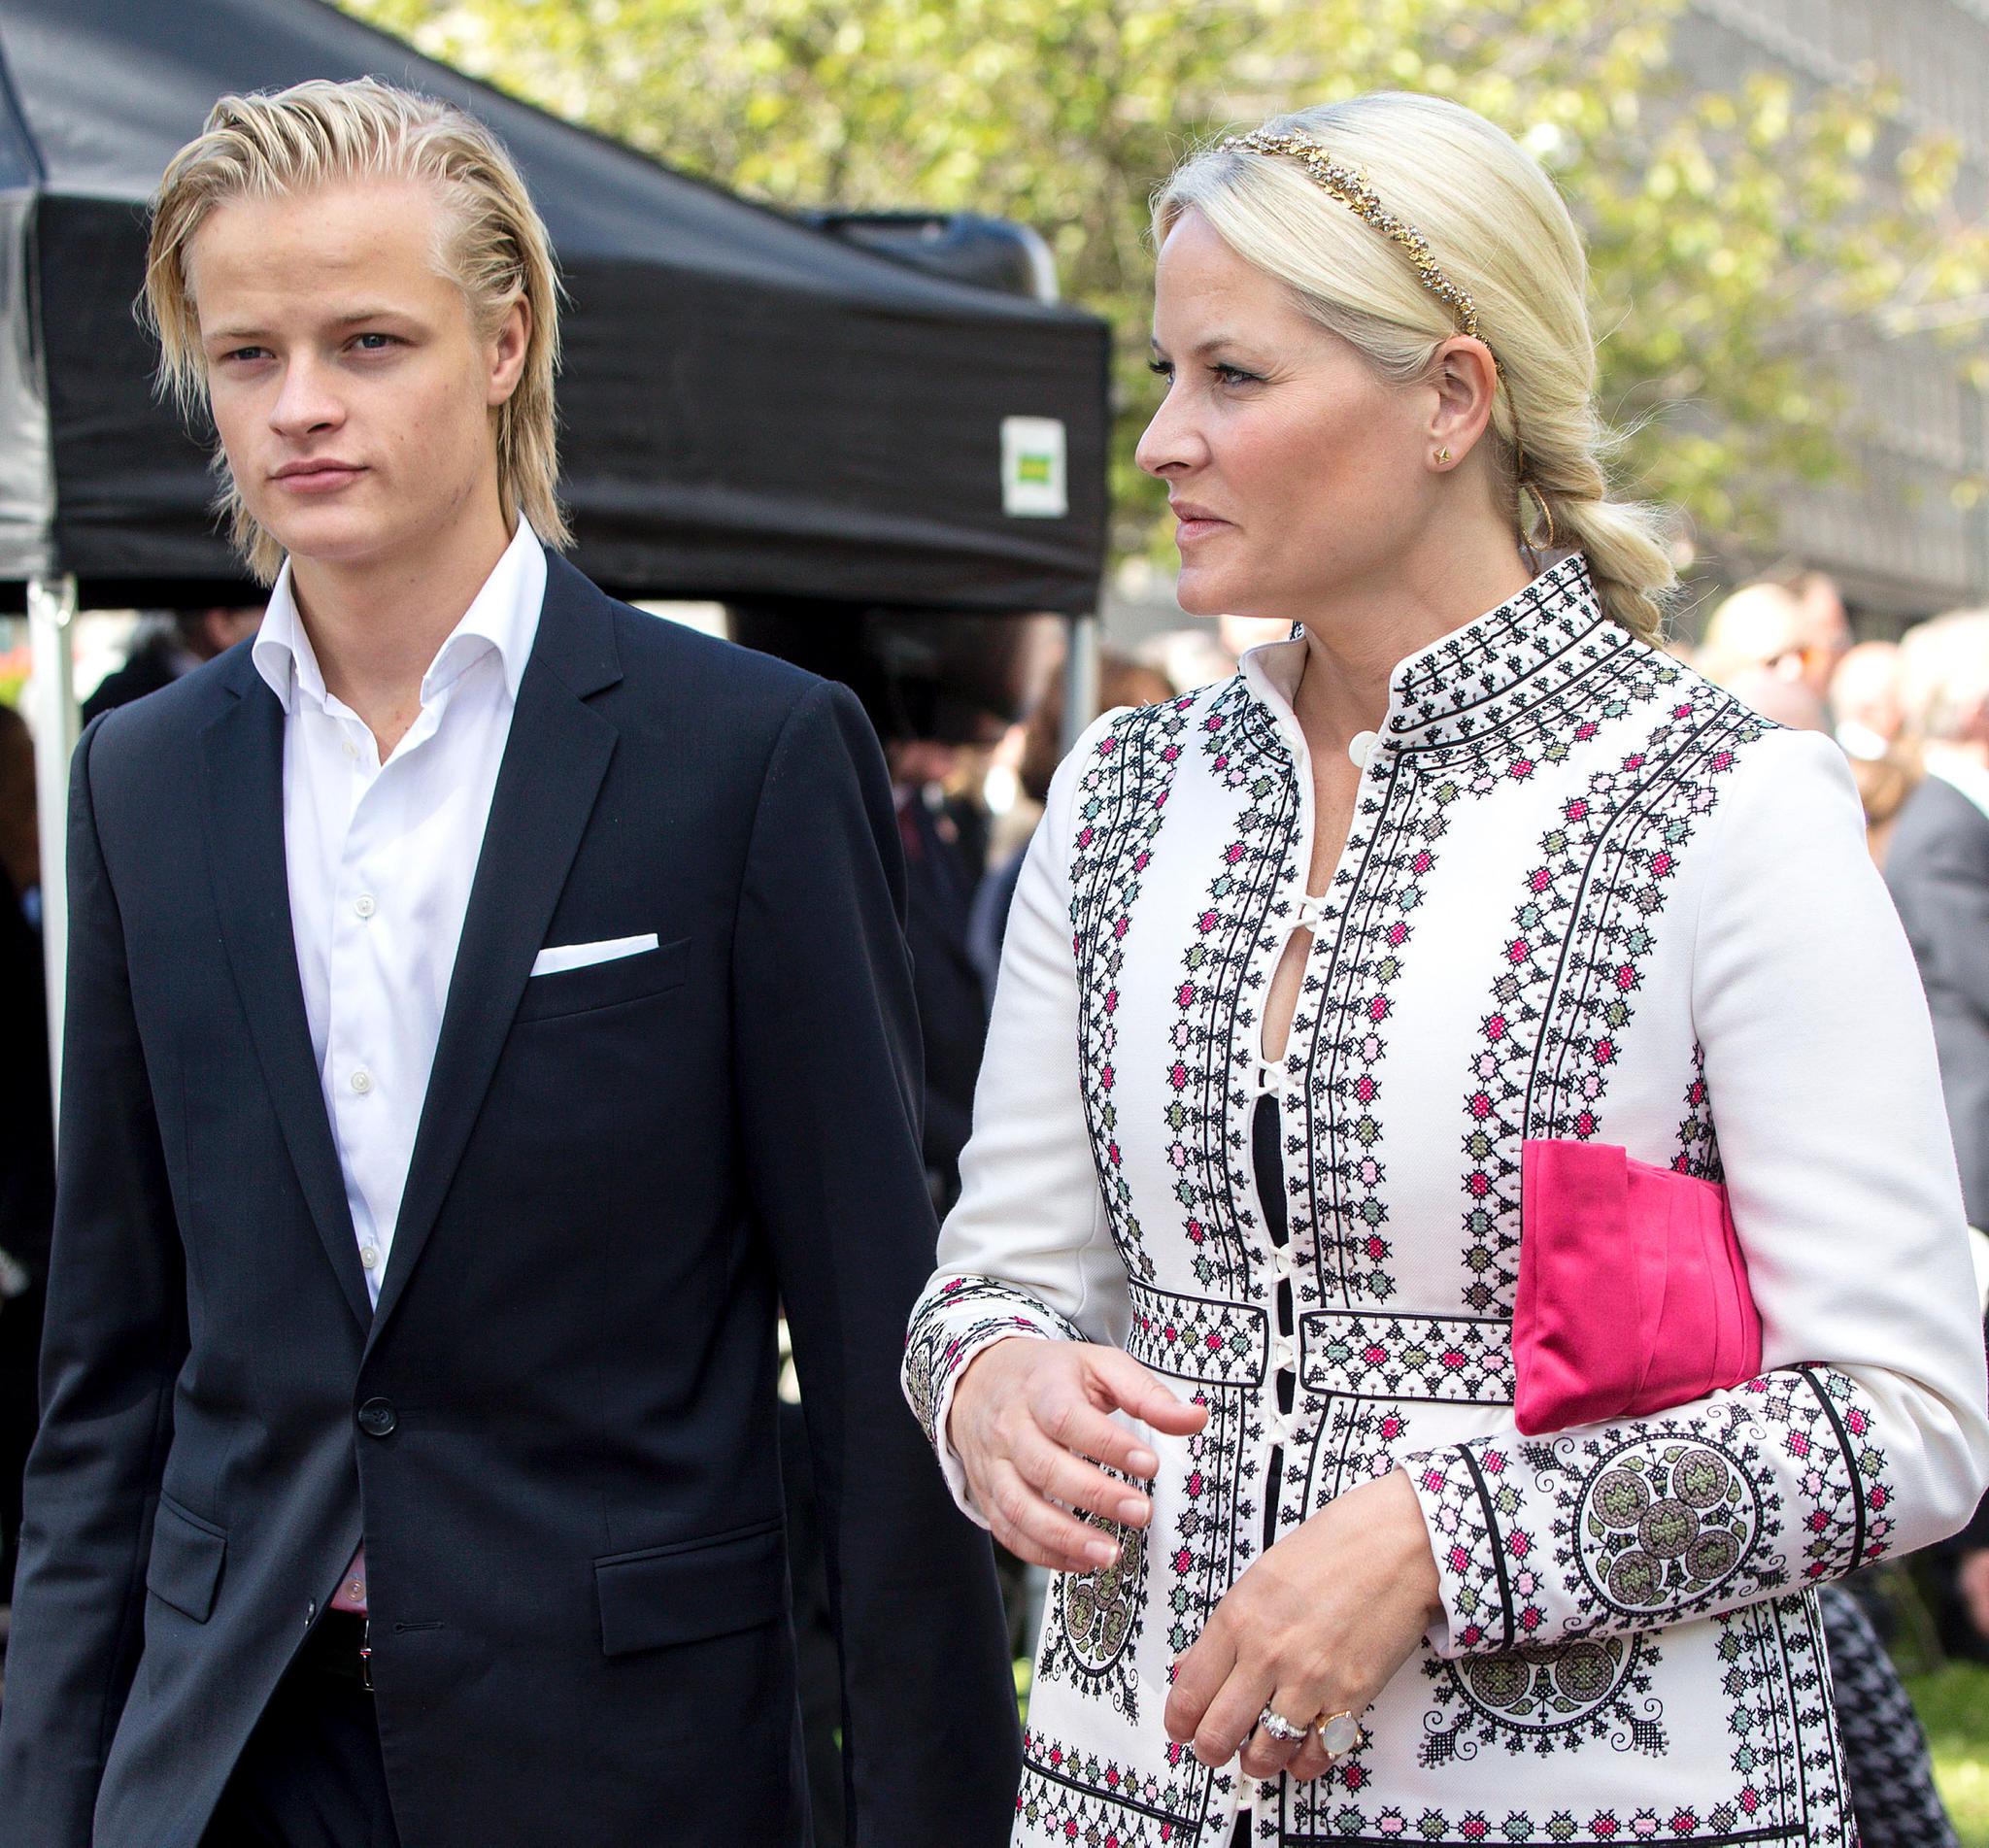 Marius Borg Høiby + Prinzessin Mette-Marit